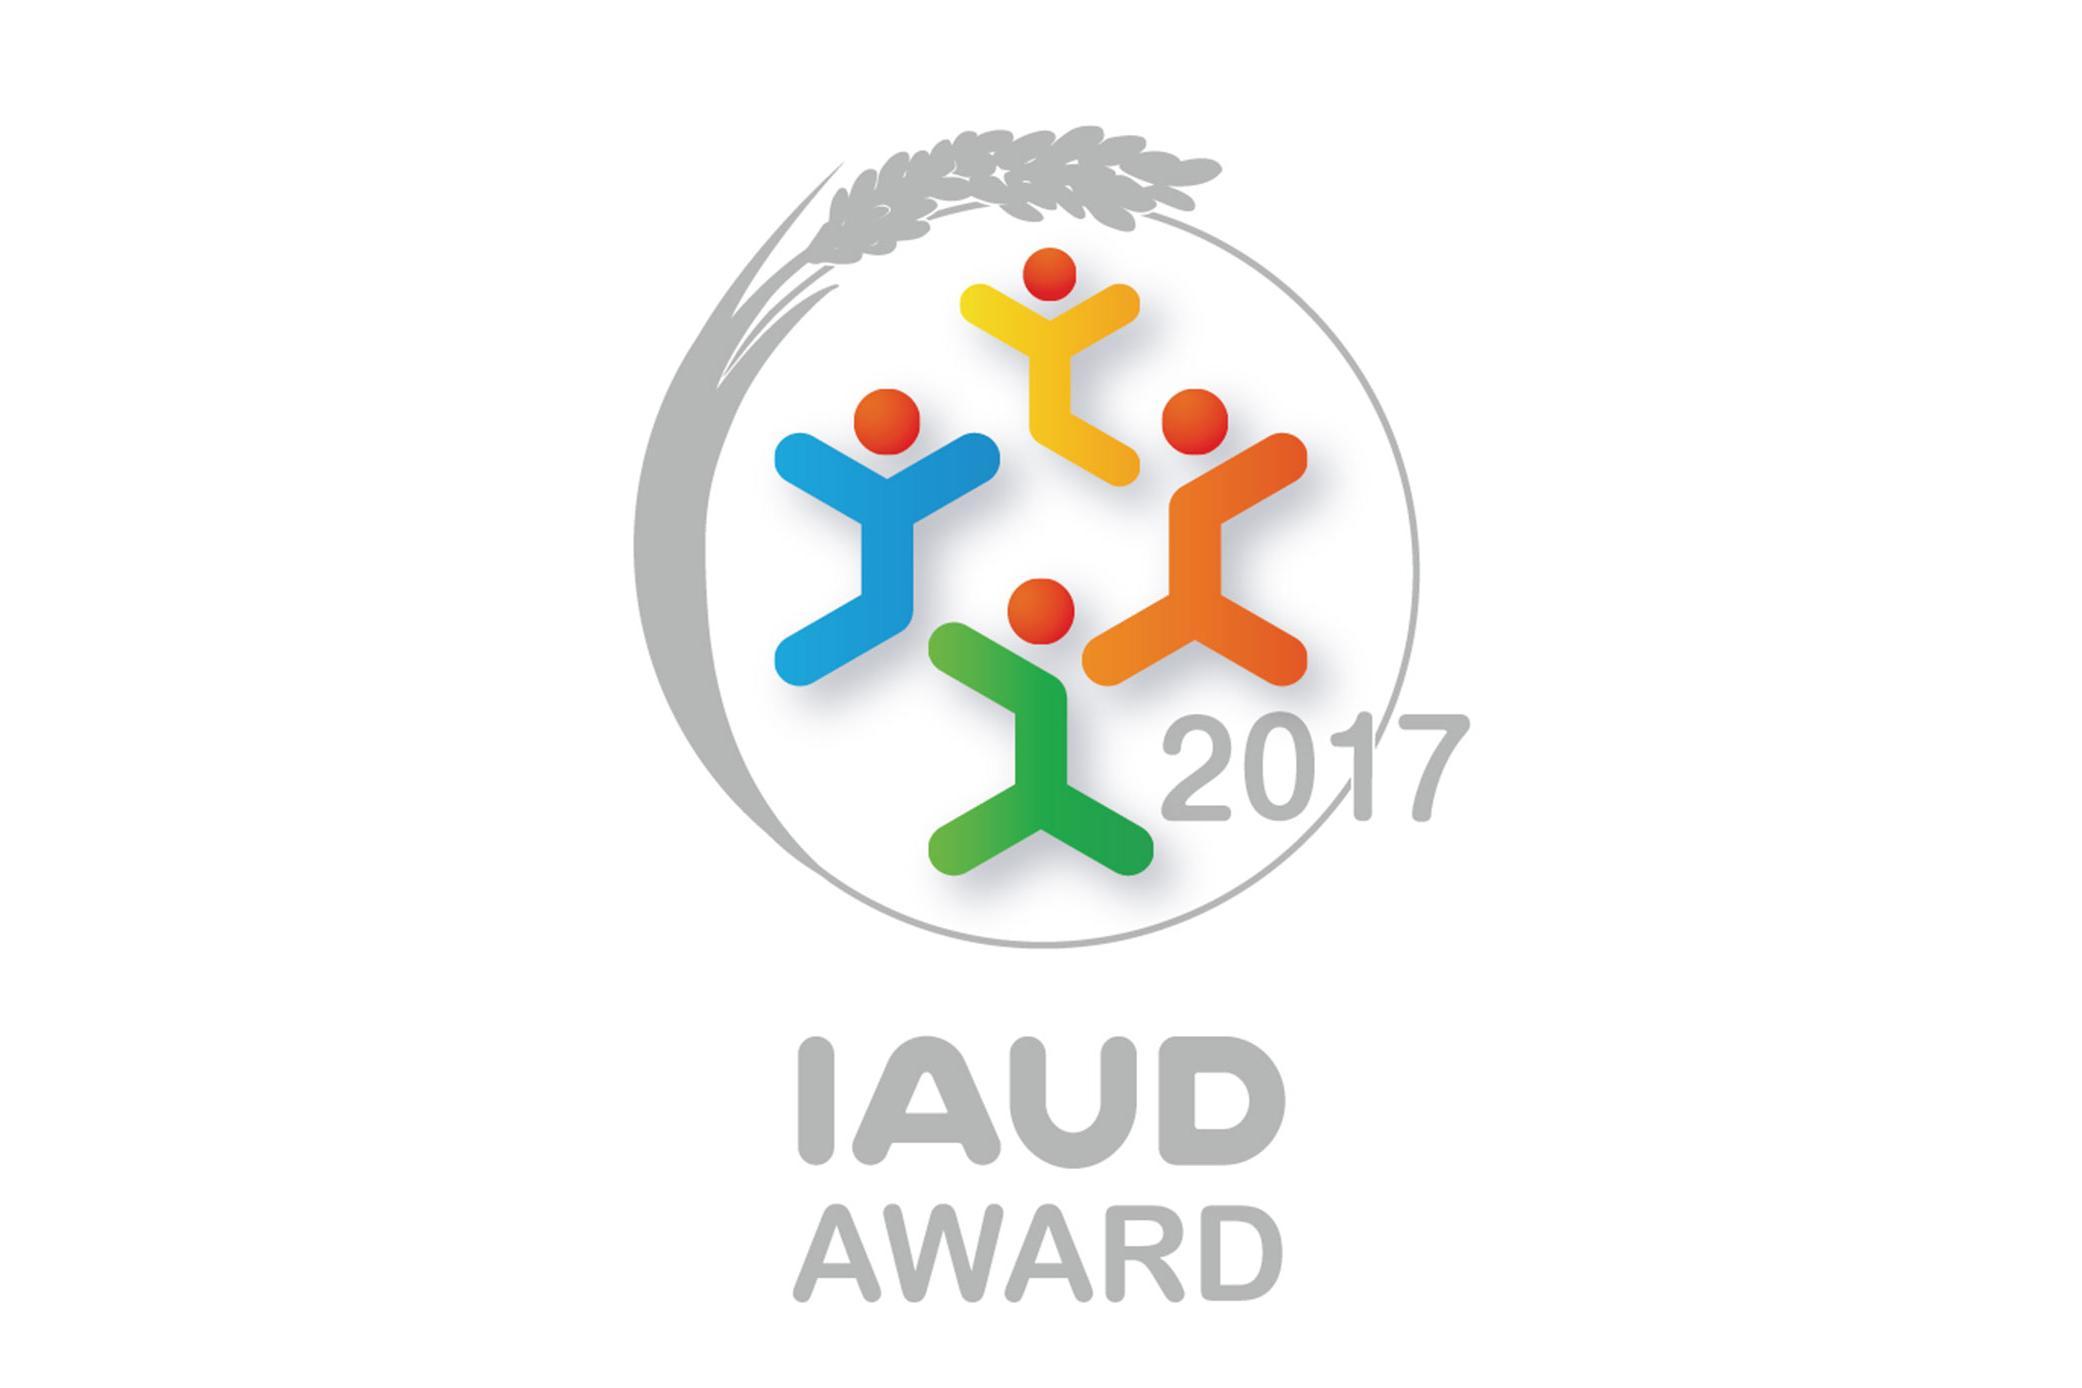 image: IAUD Award 2017 Silver Award logo